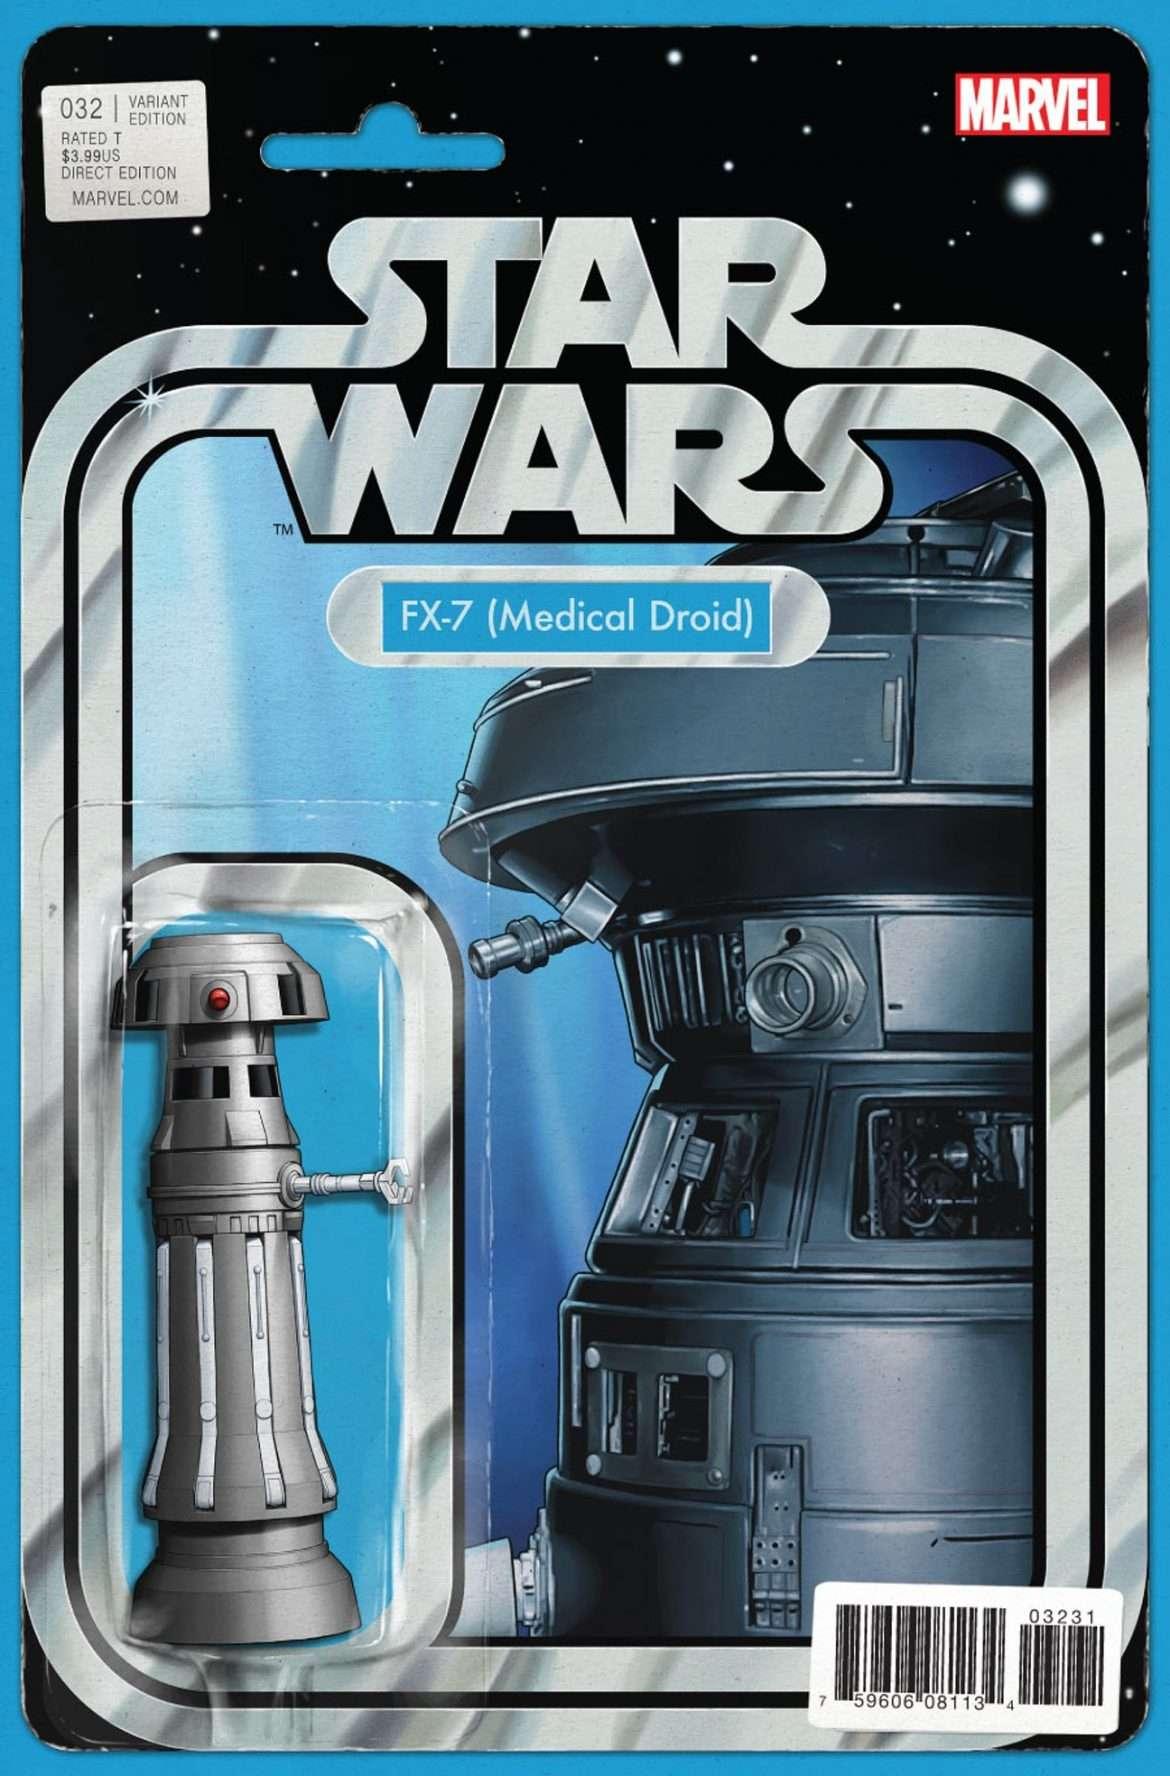 Star Wars #32 Action Figure Variant - FX-7 Medical Droid